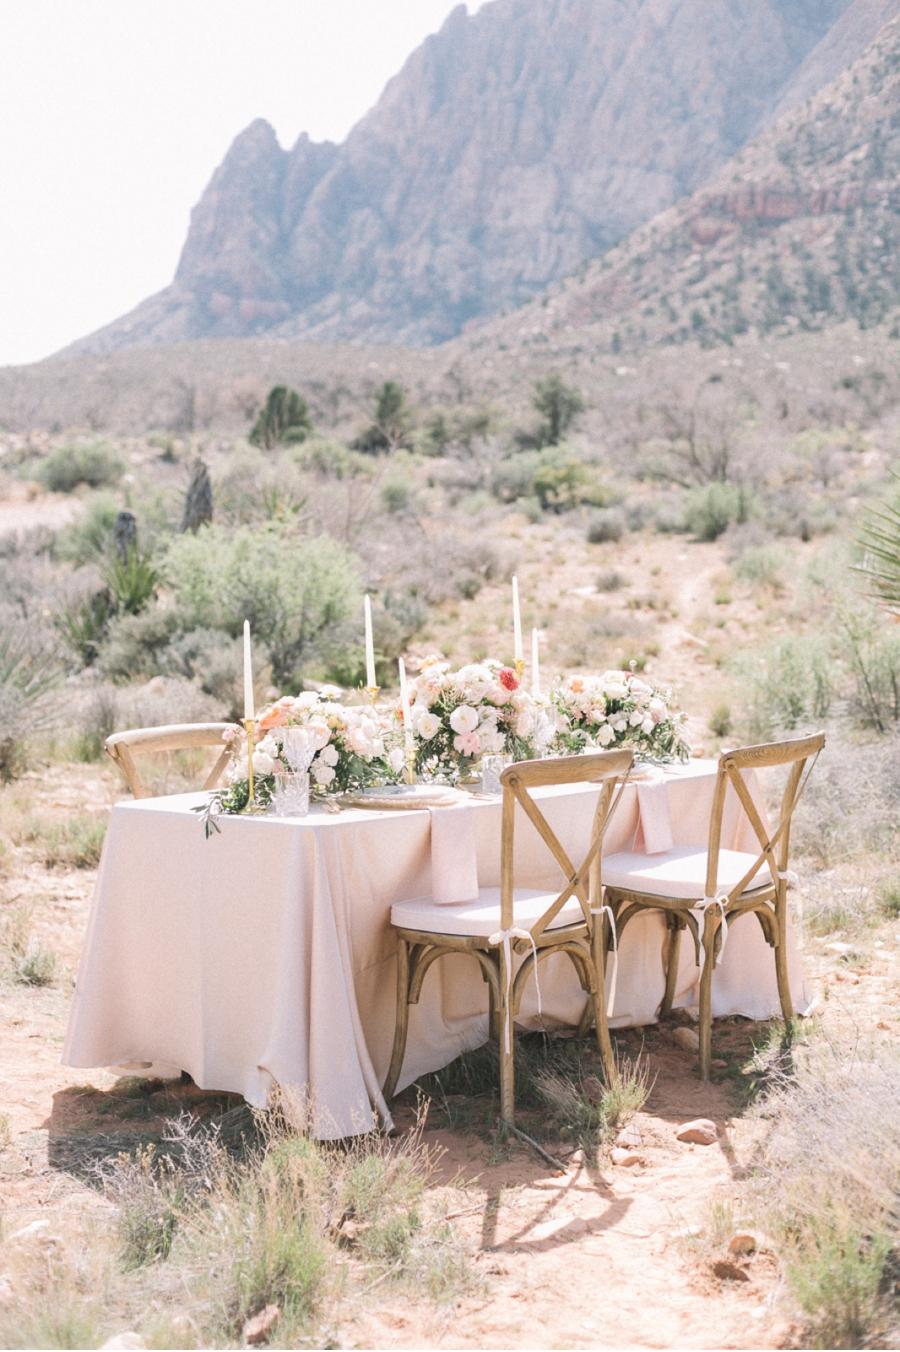 wedding-reception-desert-tablescape